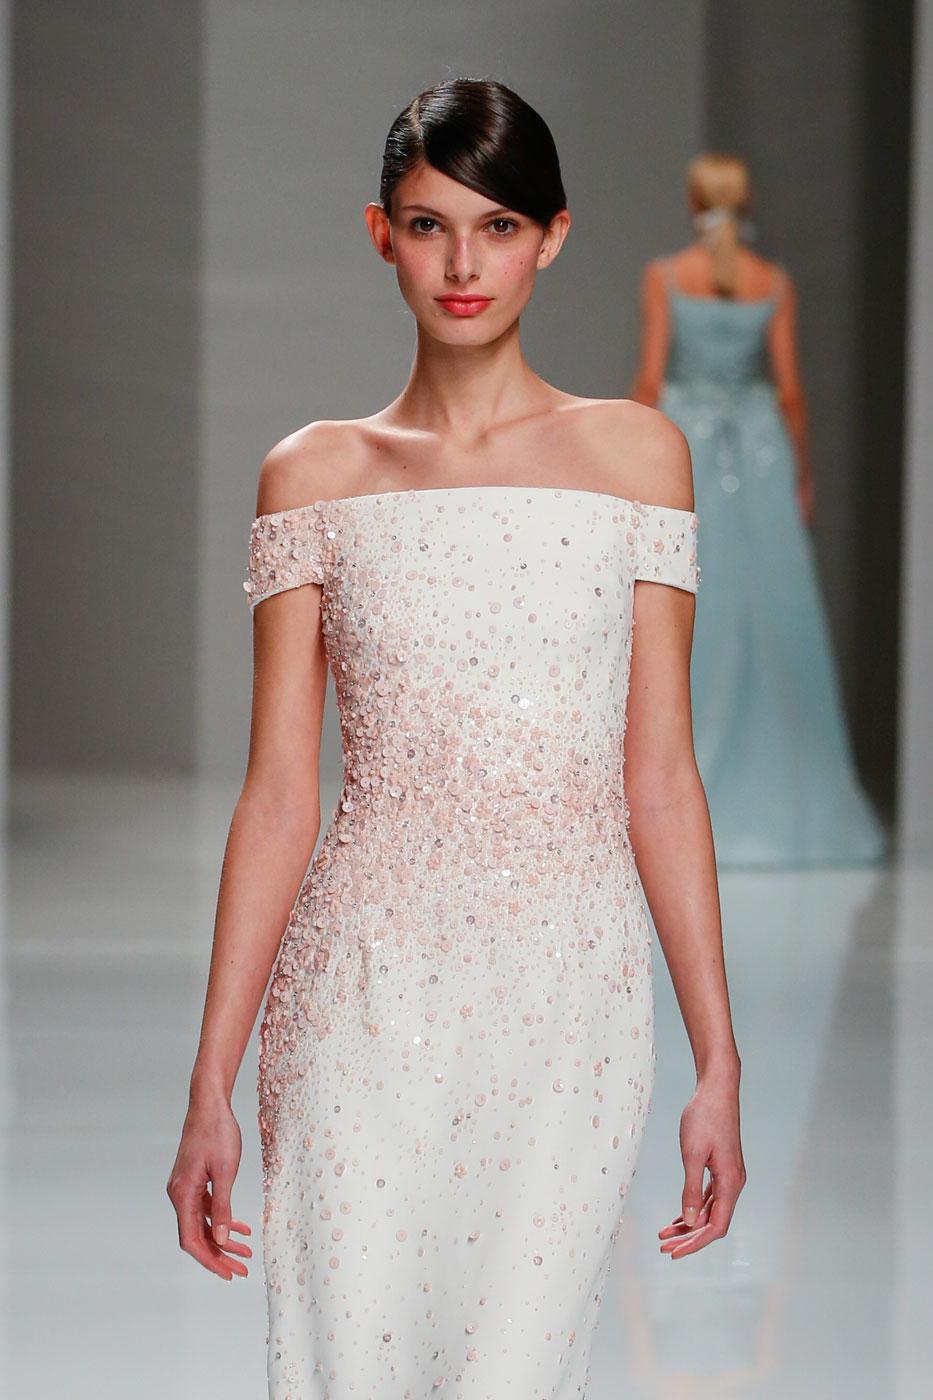 Georges-Hobeika-fashion-runway-show-haute-couture-paris-spring-2015-the-impression-48